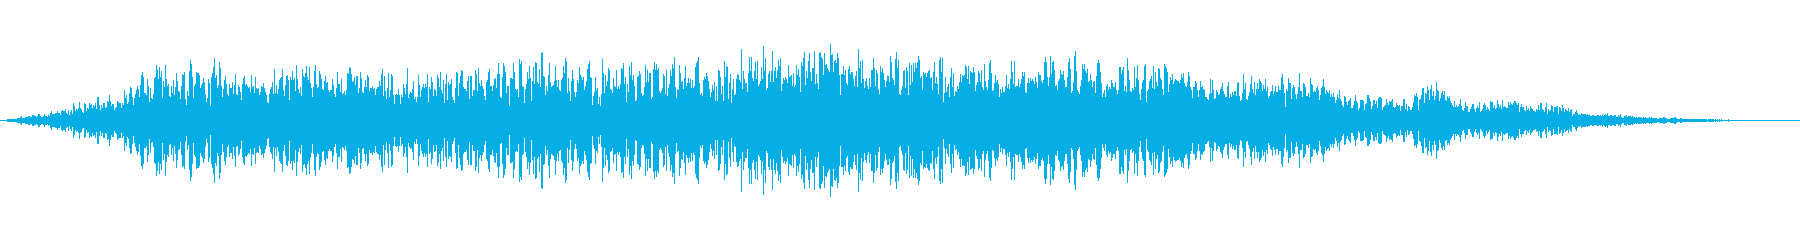 DISTANT REALM 3の再生済みの波形